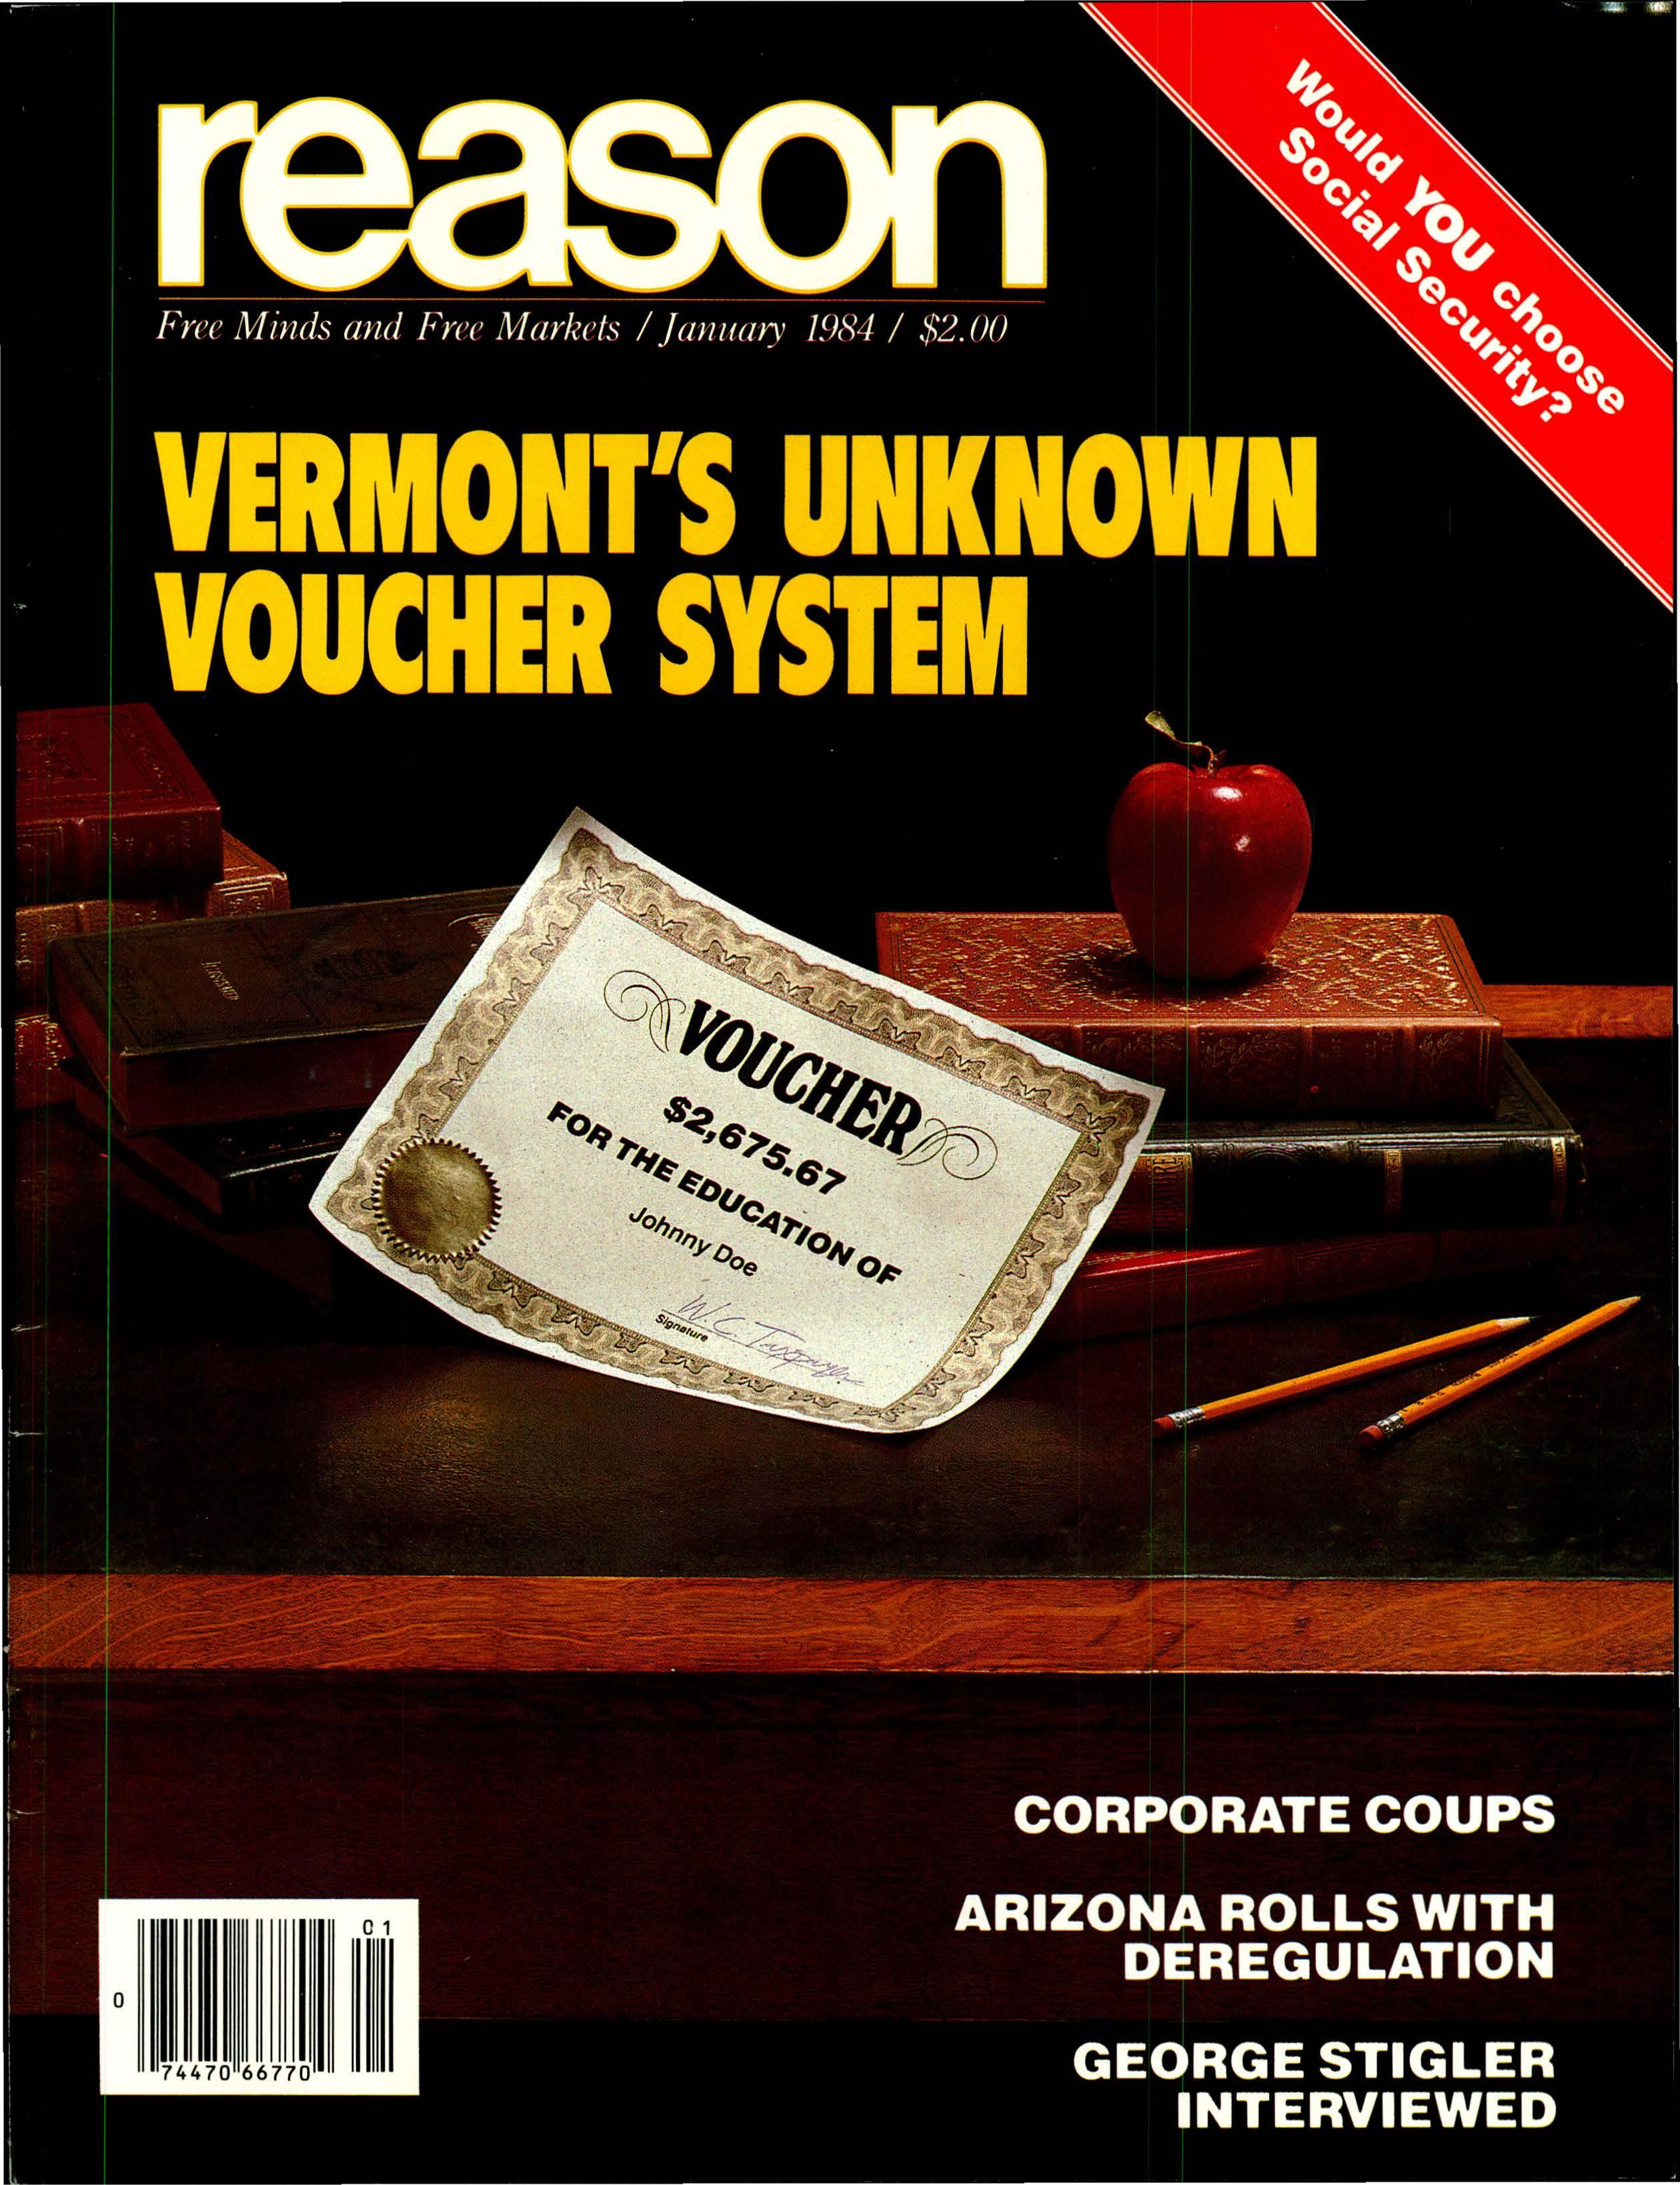 Reason Magazine, January 1984 cover image